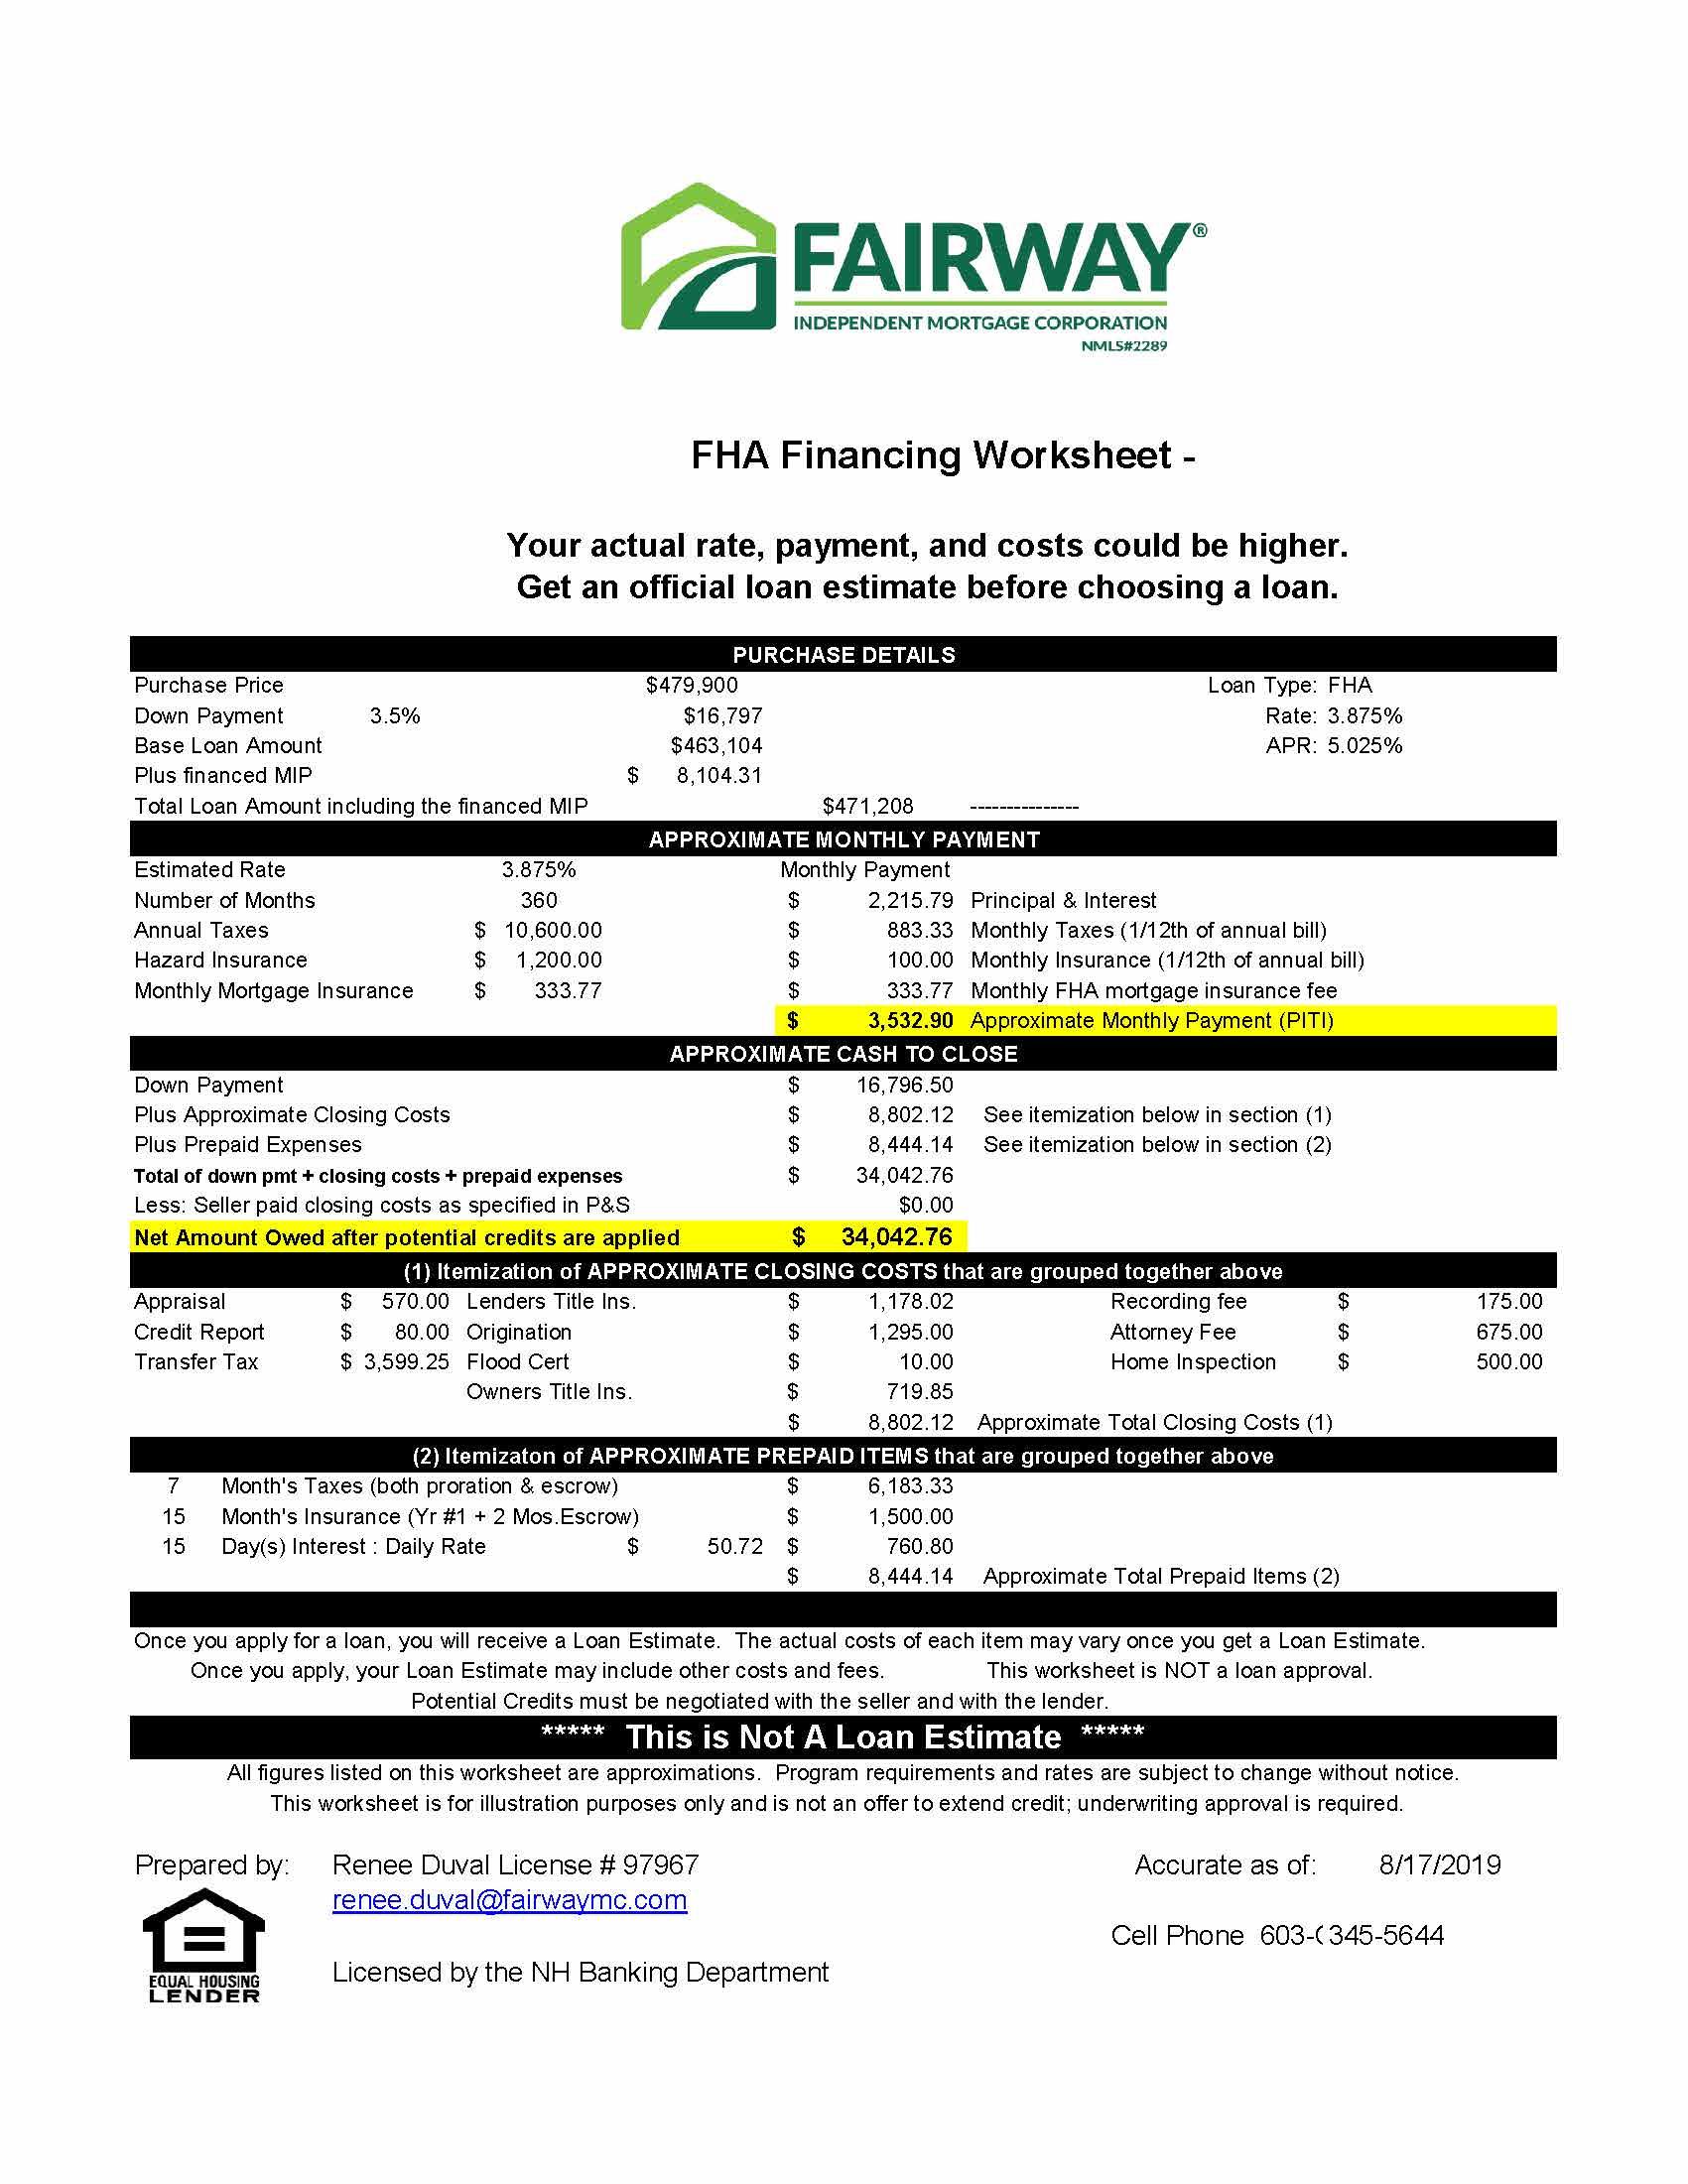 Fha Purchase Worksheet 1 Gulf Rd